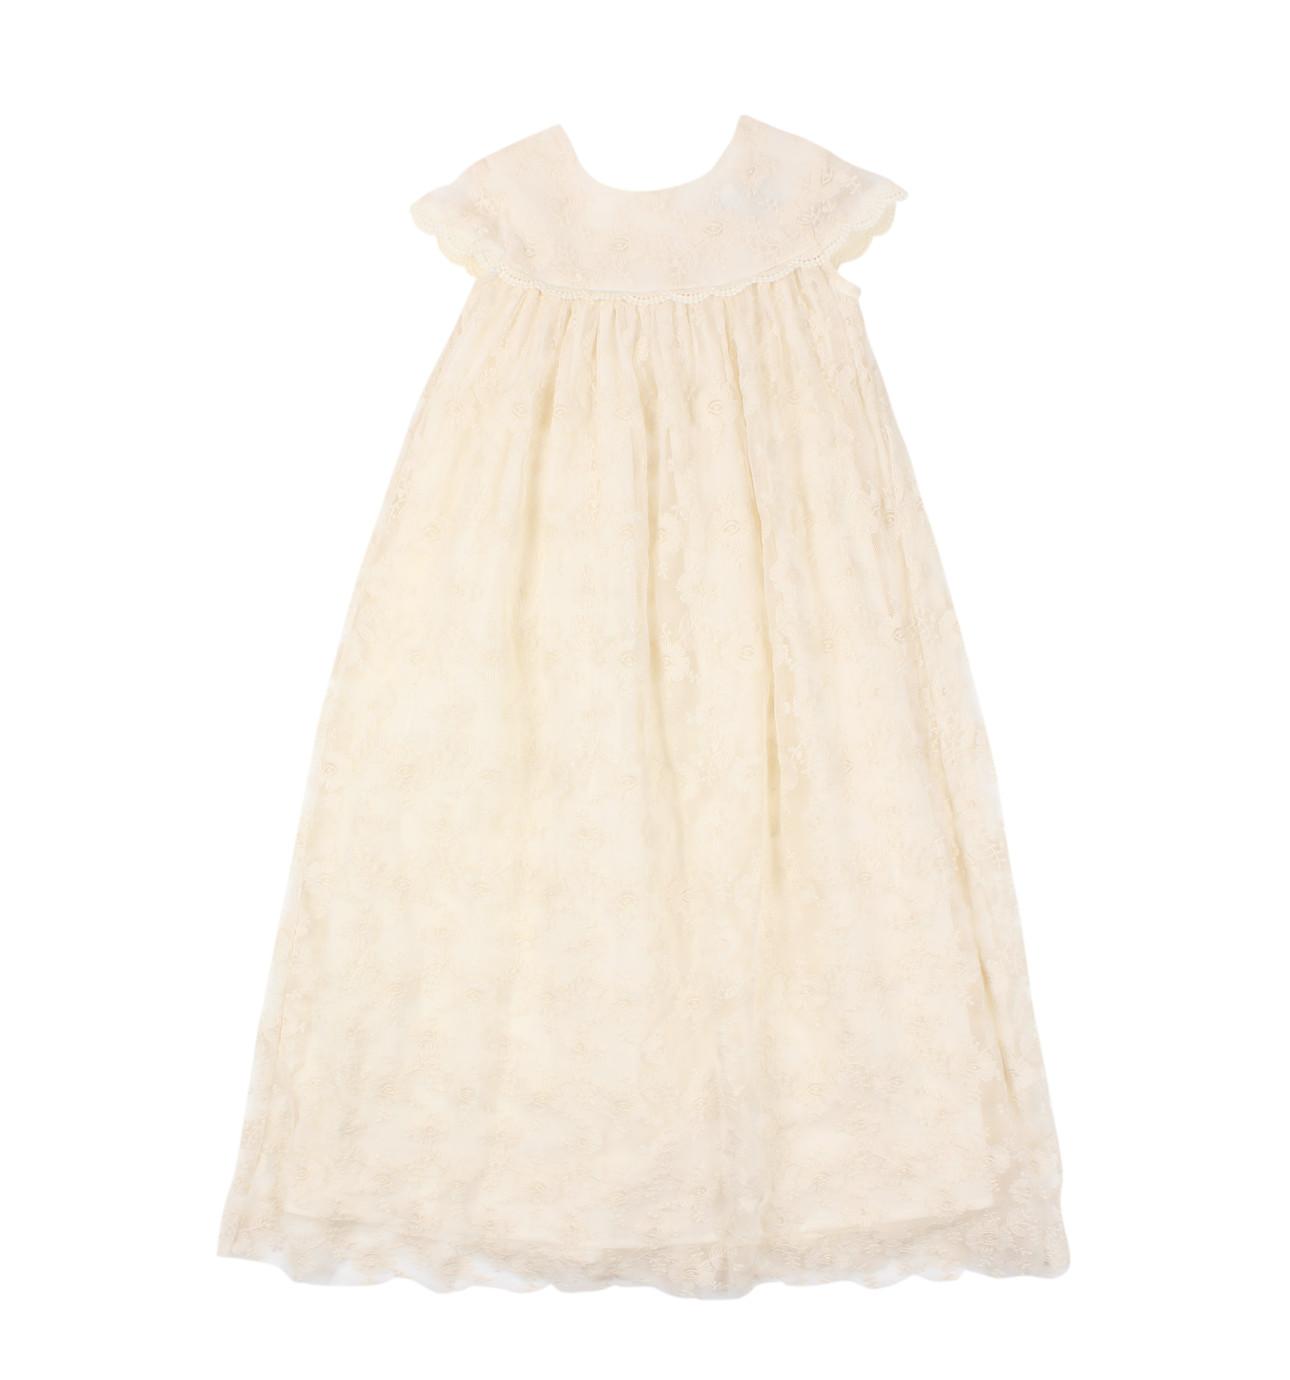 White dress david jones - Short Sleeve Lace Long Christening Gown